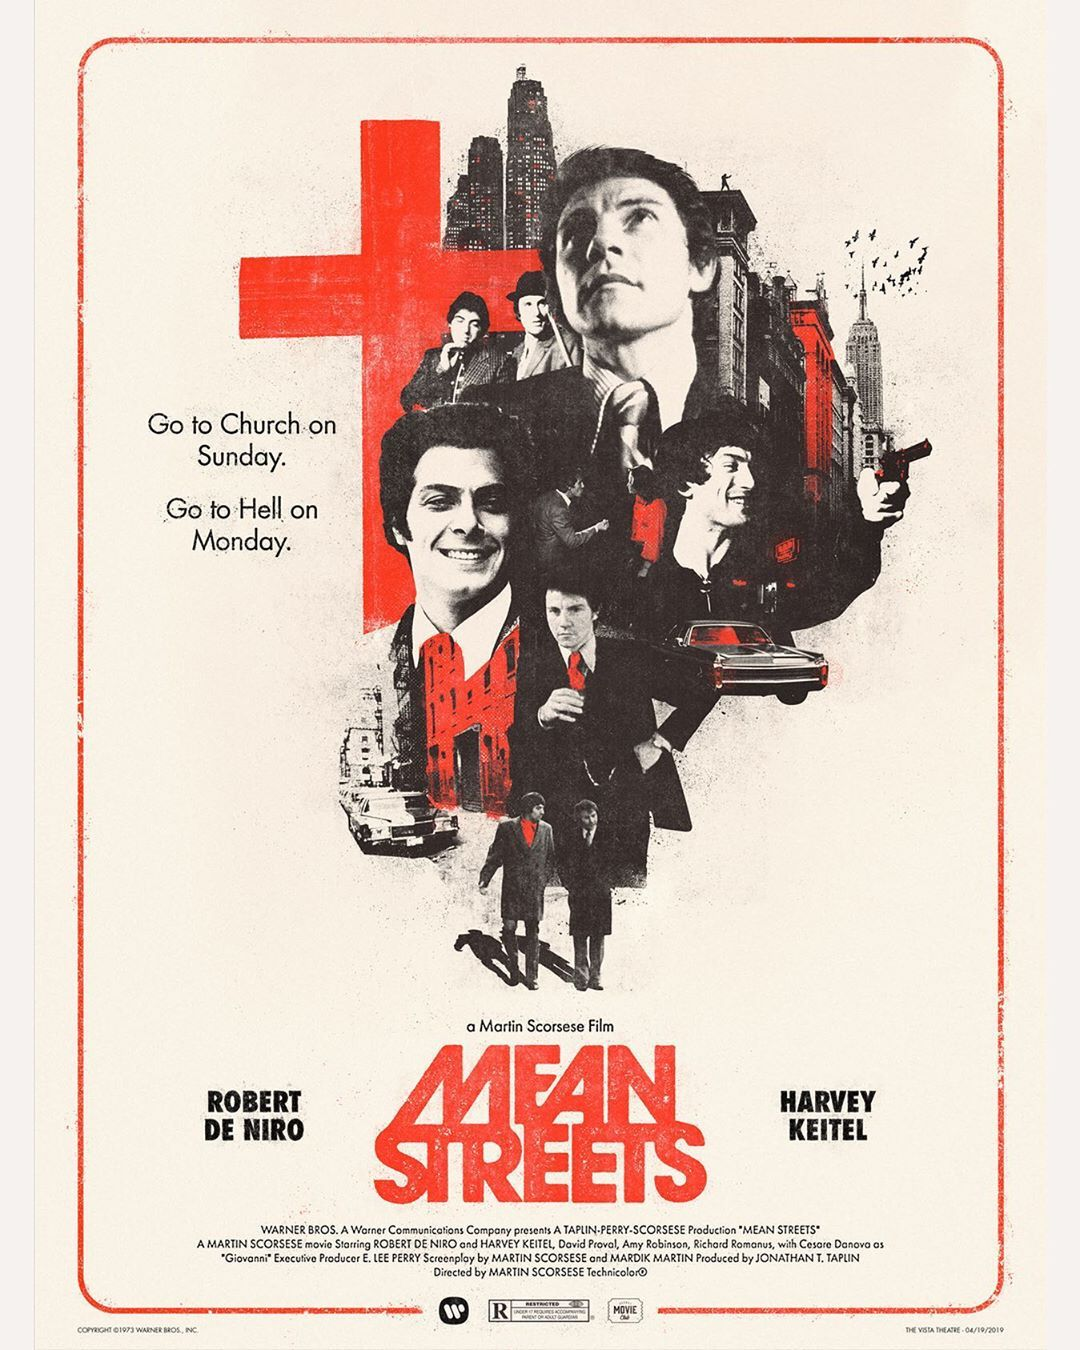 MEAN STREETS 1973 Martin Scorsese Movie Cinema Poster Art Print